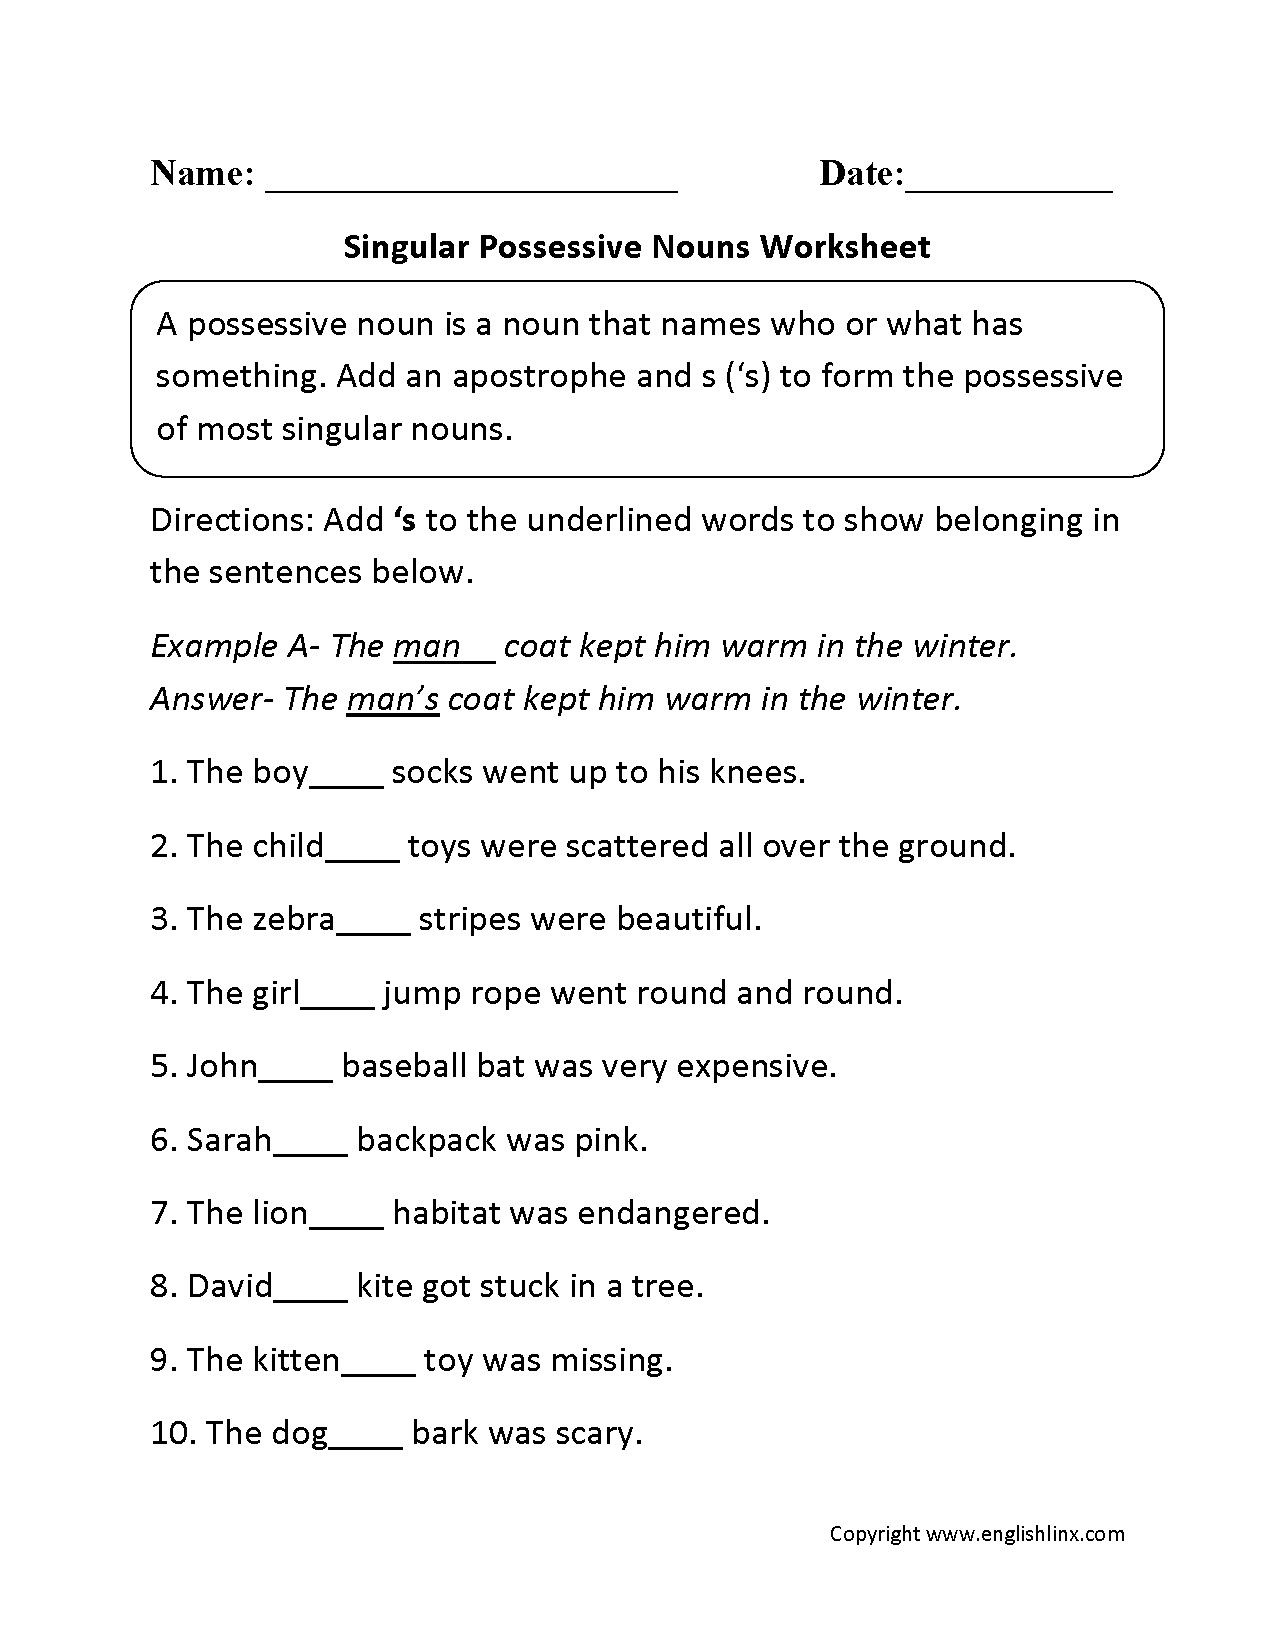 Recent 7th Grade Language Arts Worksheets Possessive Nouns